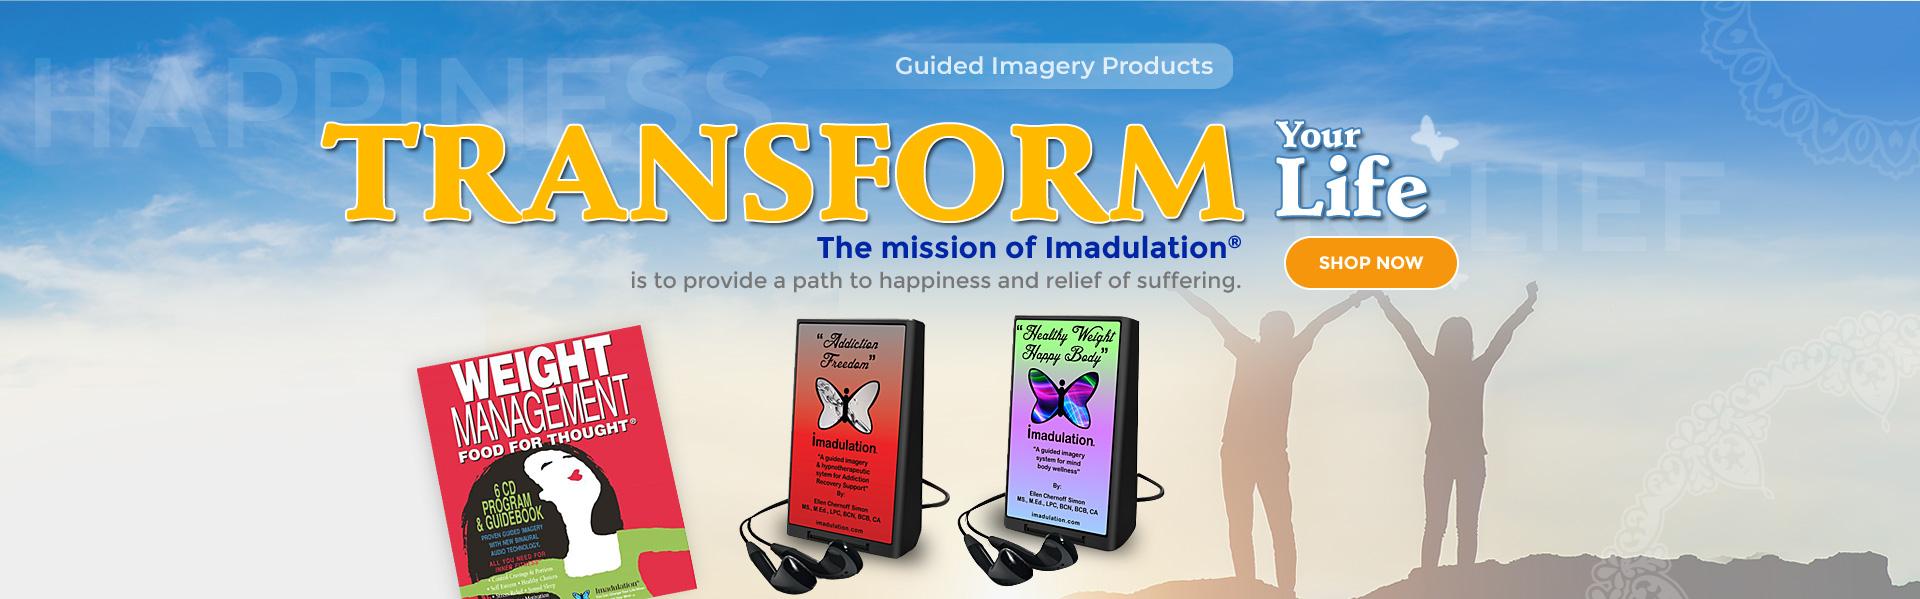 Imadulation Guided Imagery Audio